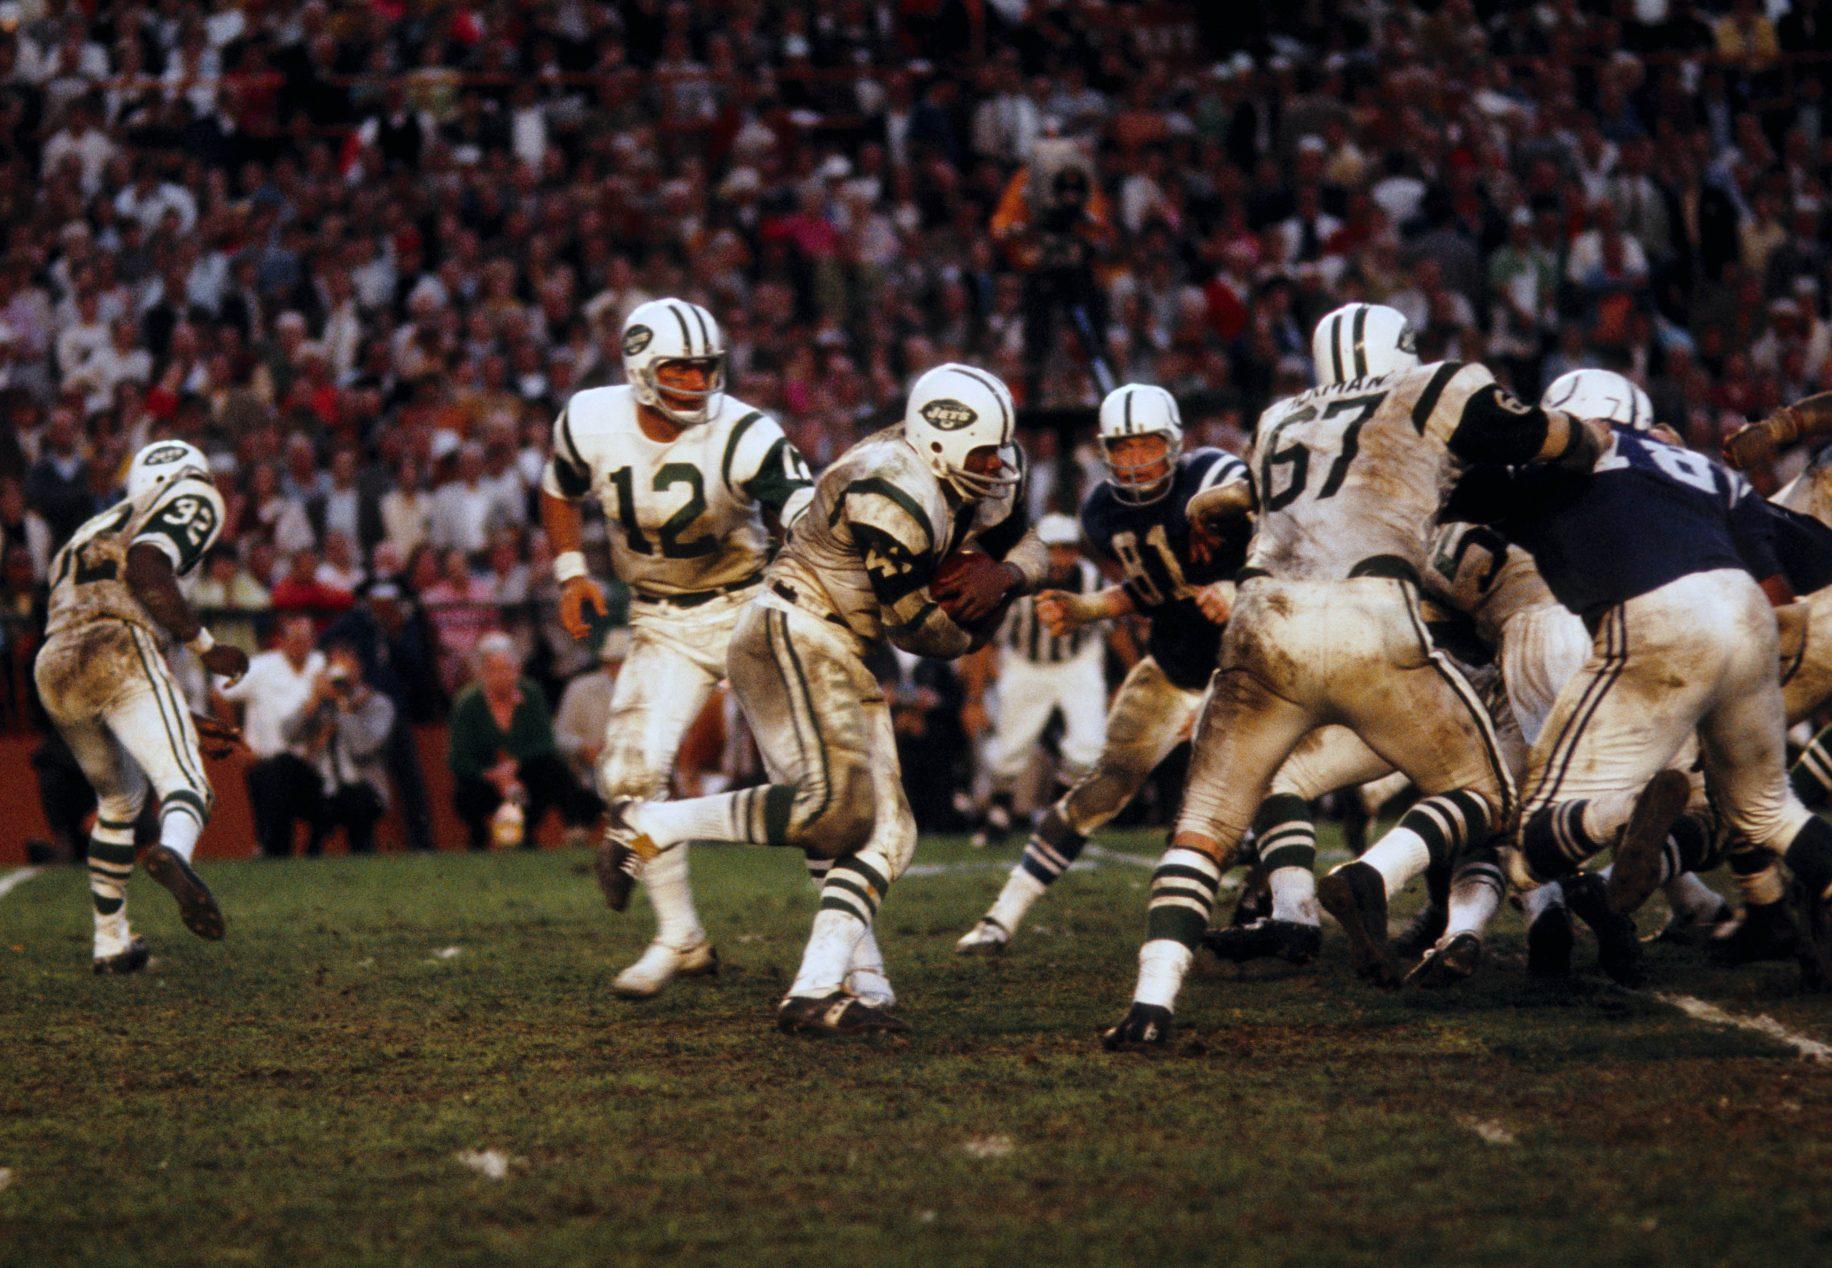 c54fc3a4d5b New York Jets All-Time Ultimate 53-Man Roster: Joe Namath, Joe ...